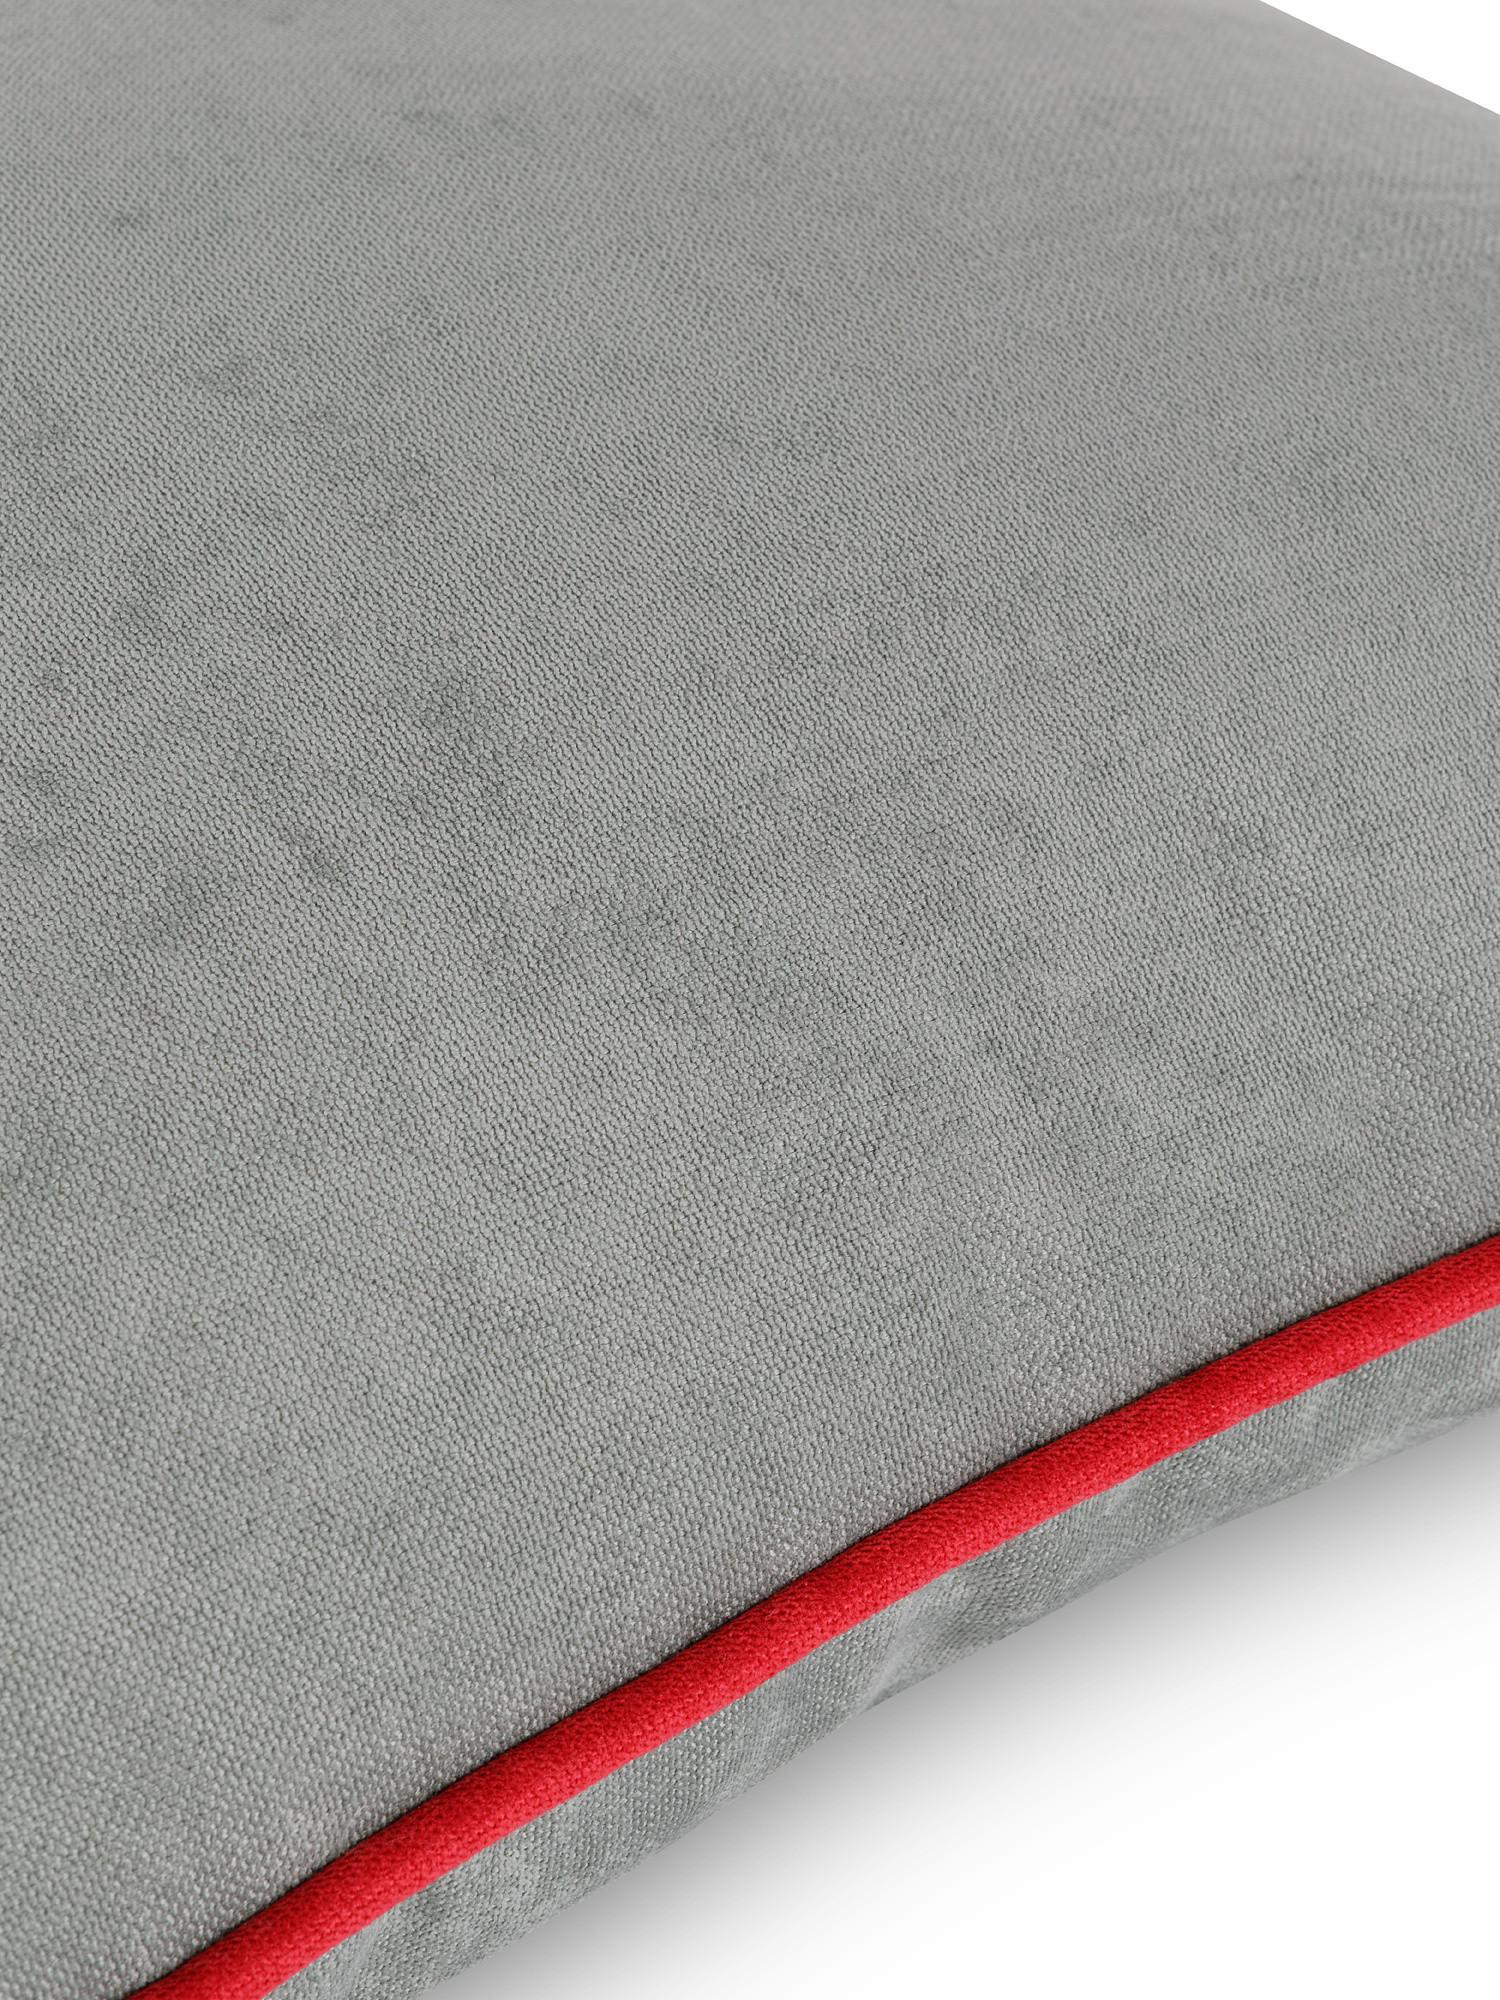 Cuscino tessuto effetto mélange 50x50cm, Grigio, large image number 2